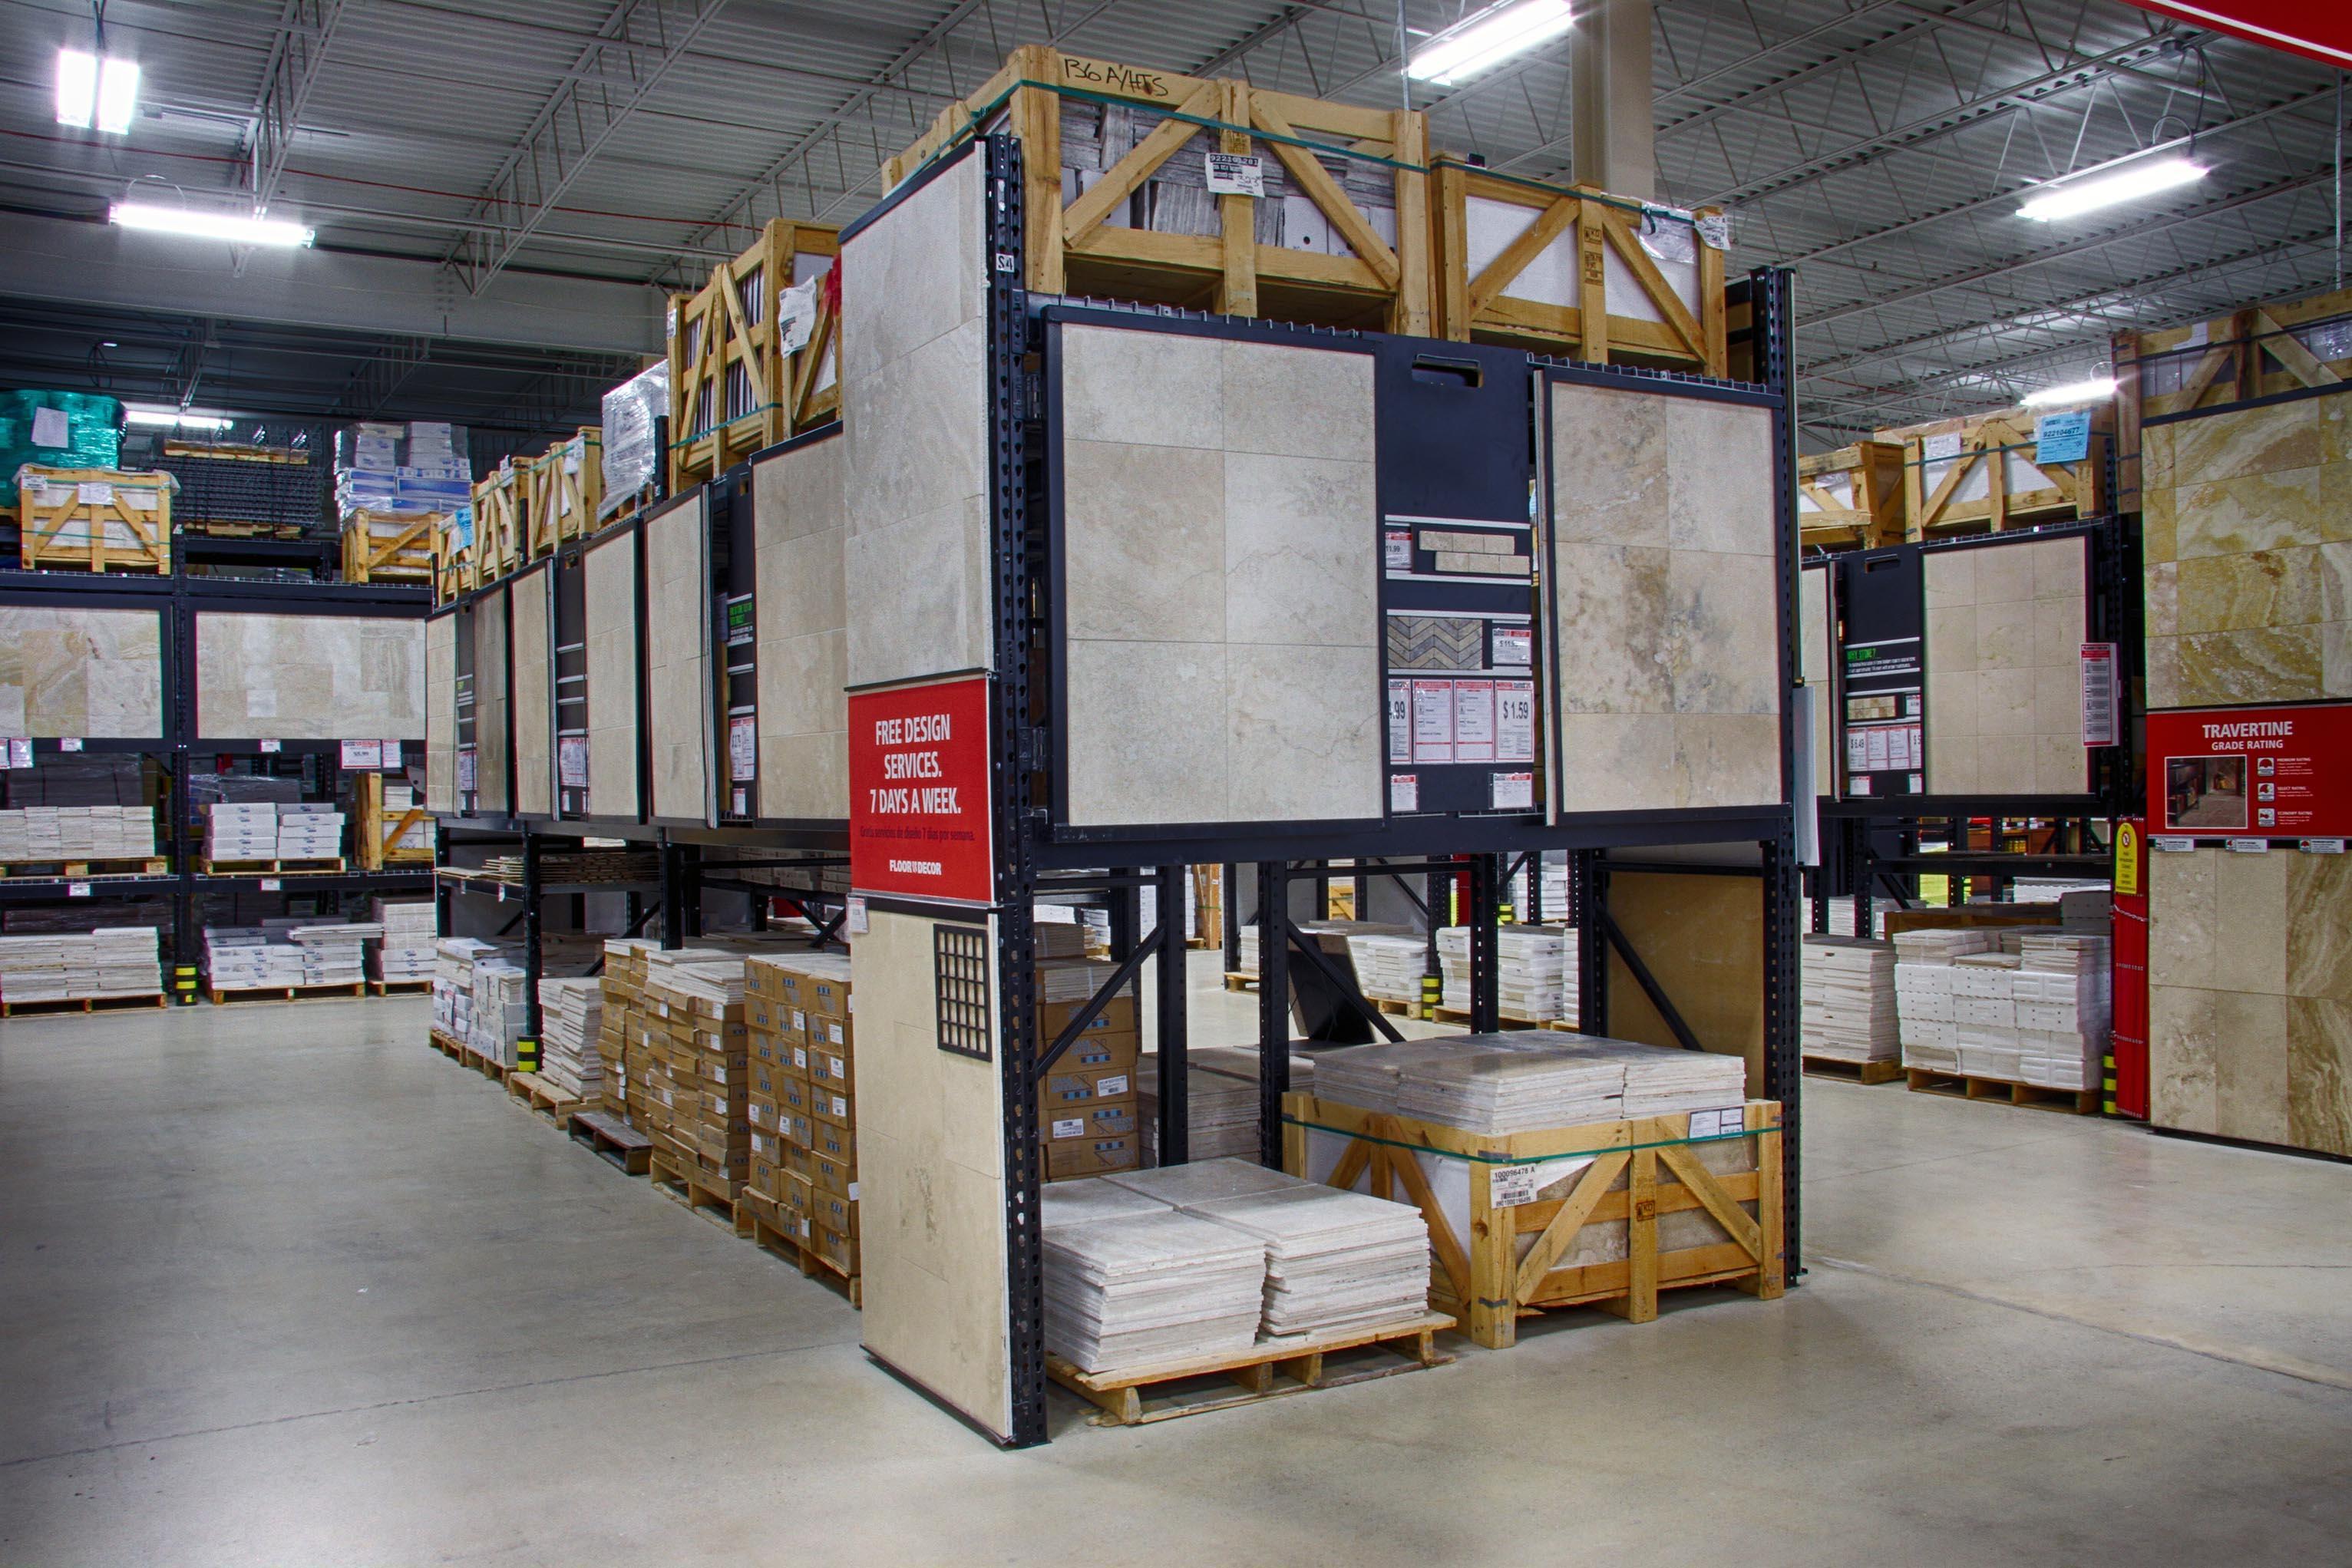 Floor Decor 307 Il 59 Aurora Il Floor Coverings Retail Mapquest